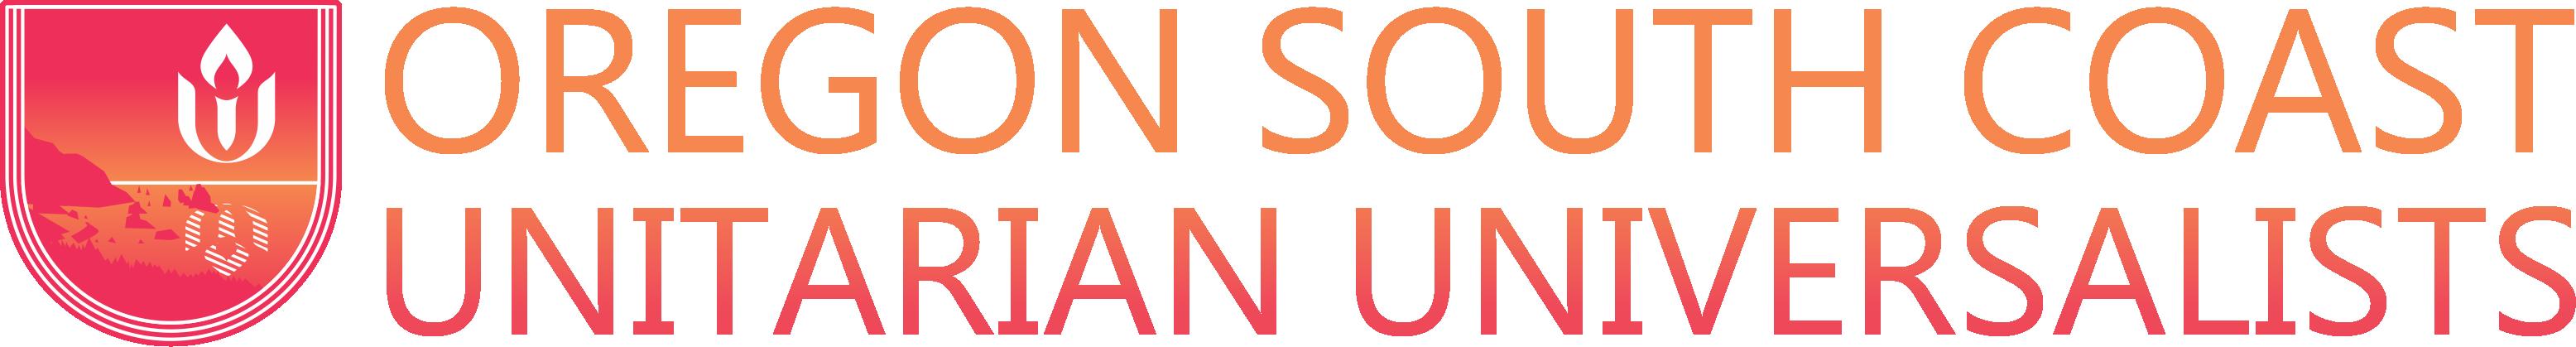 Oregon South Coast Unitarian Universalists